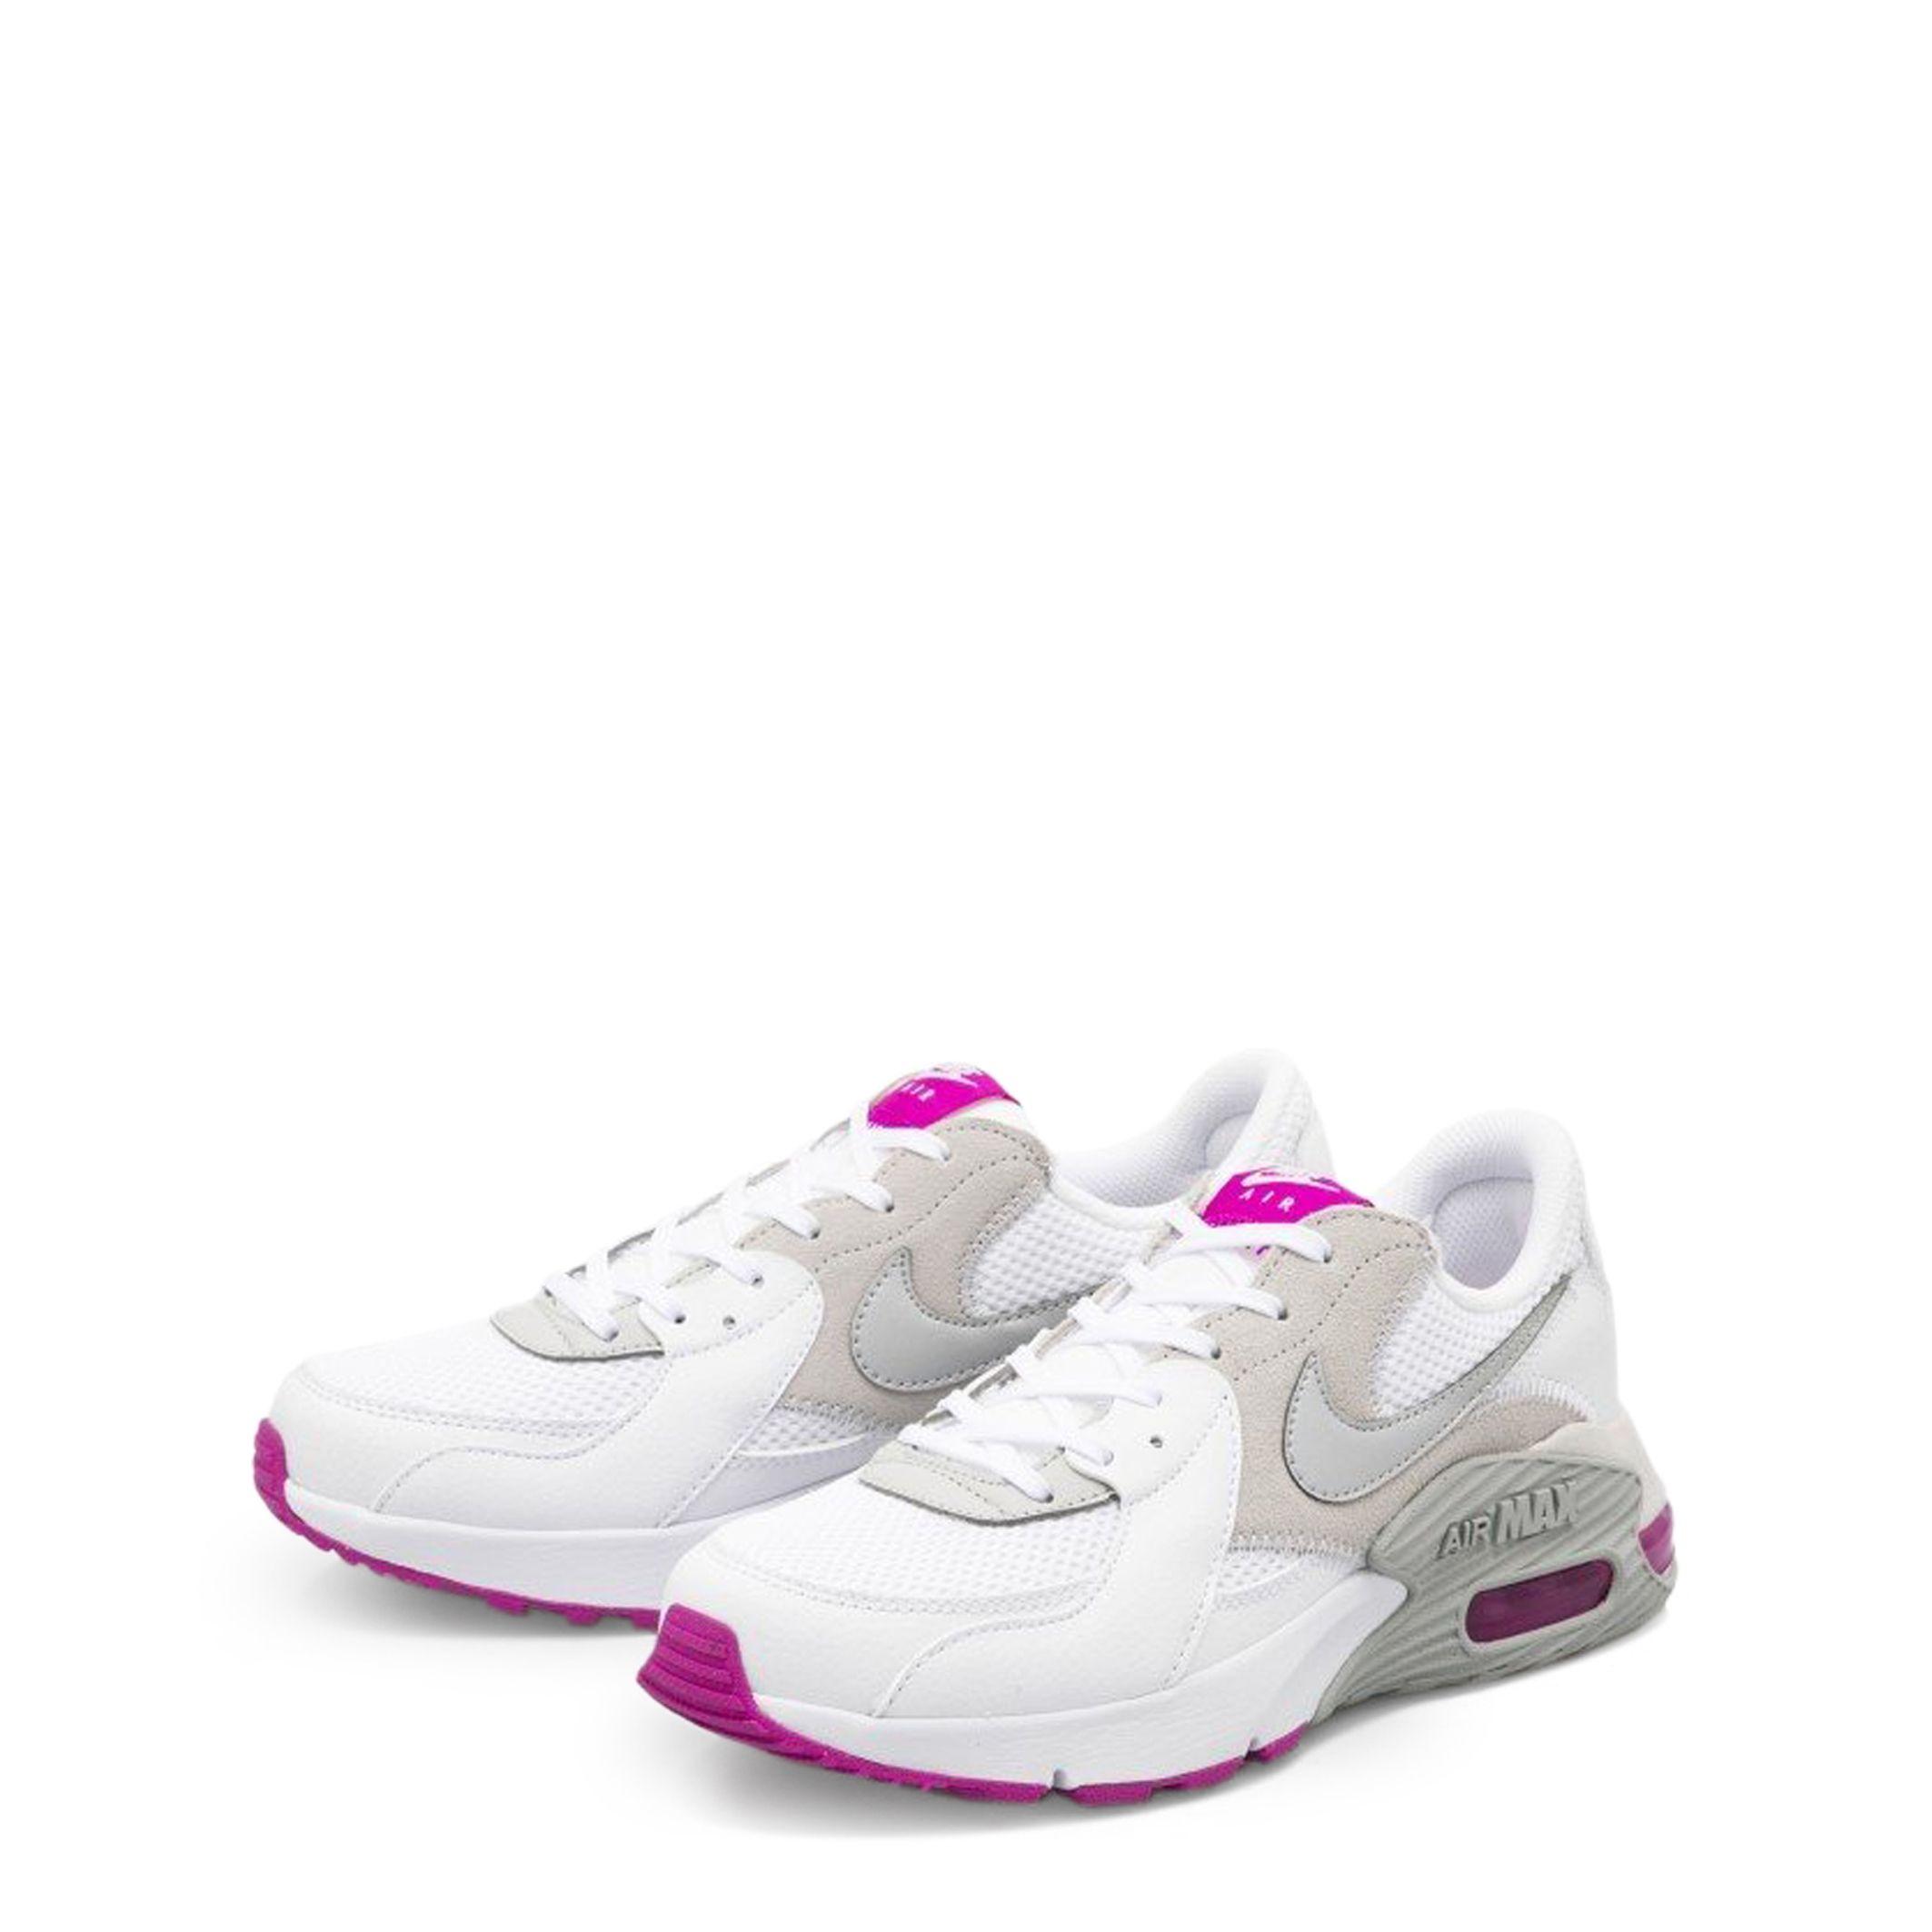 Nike – AirMaxExcee